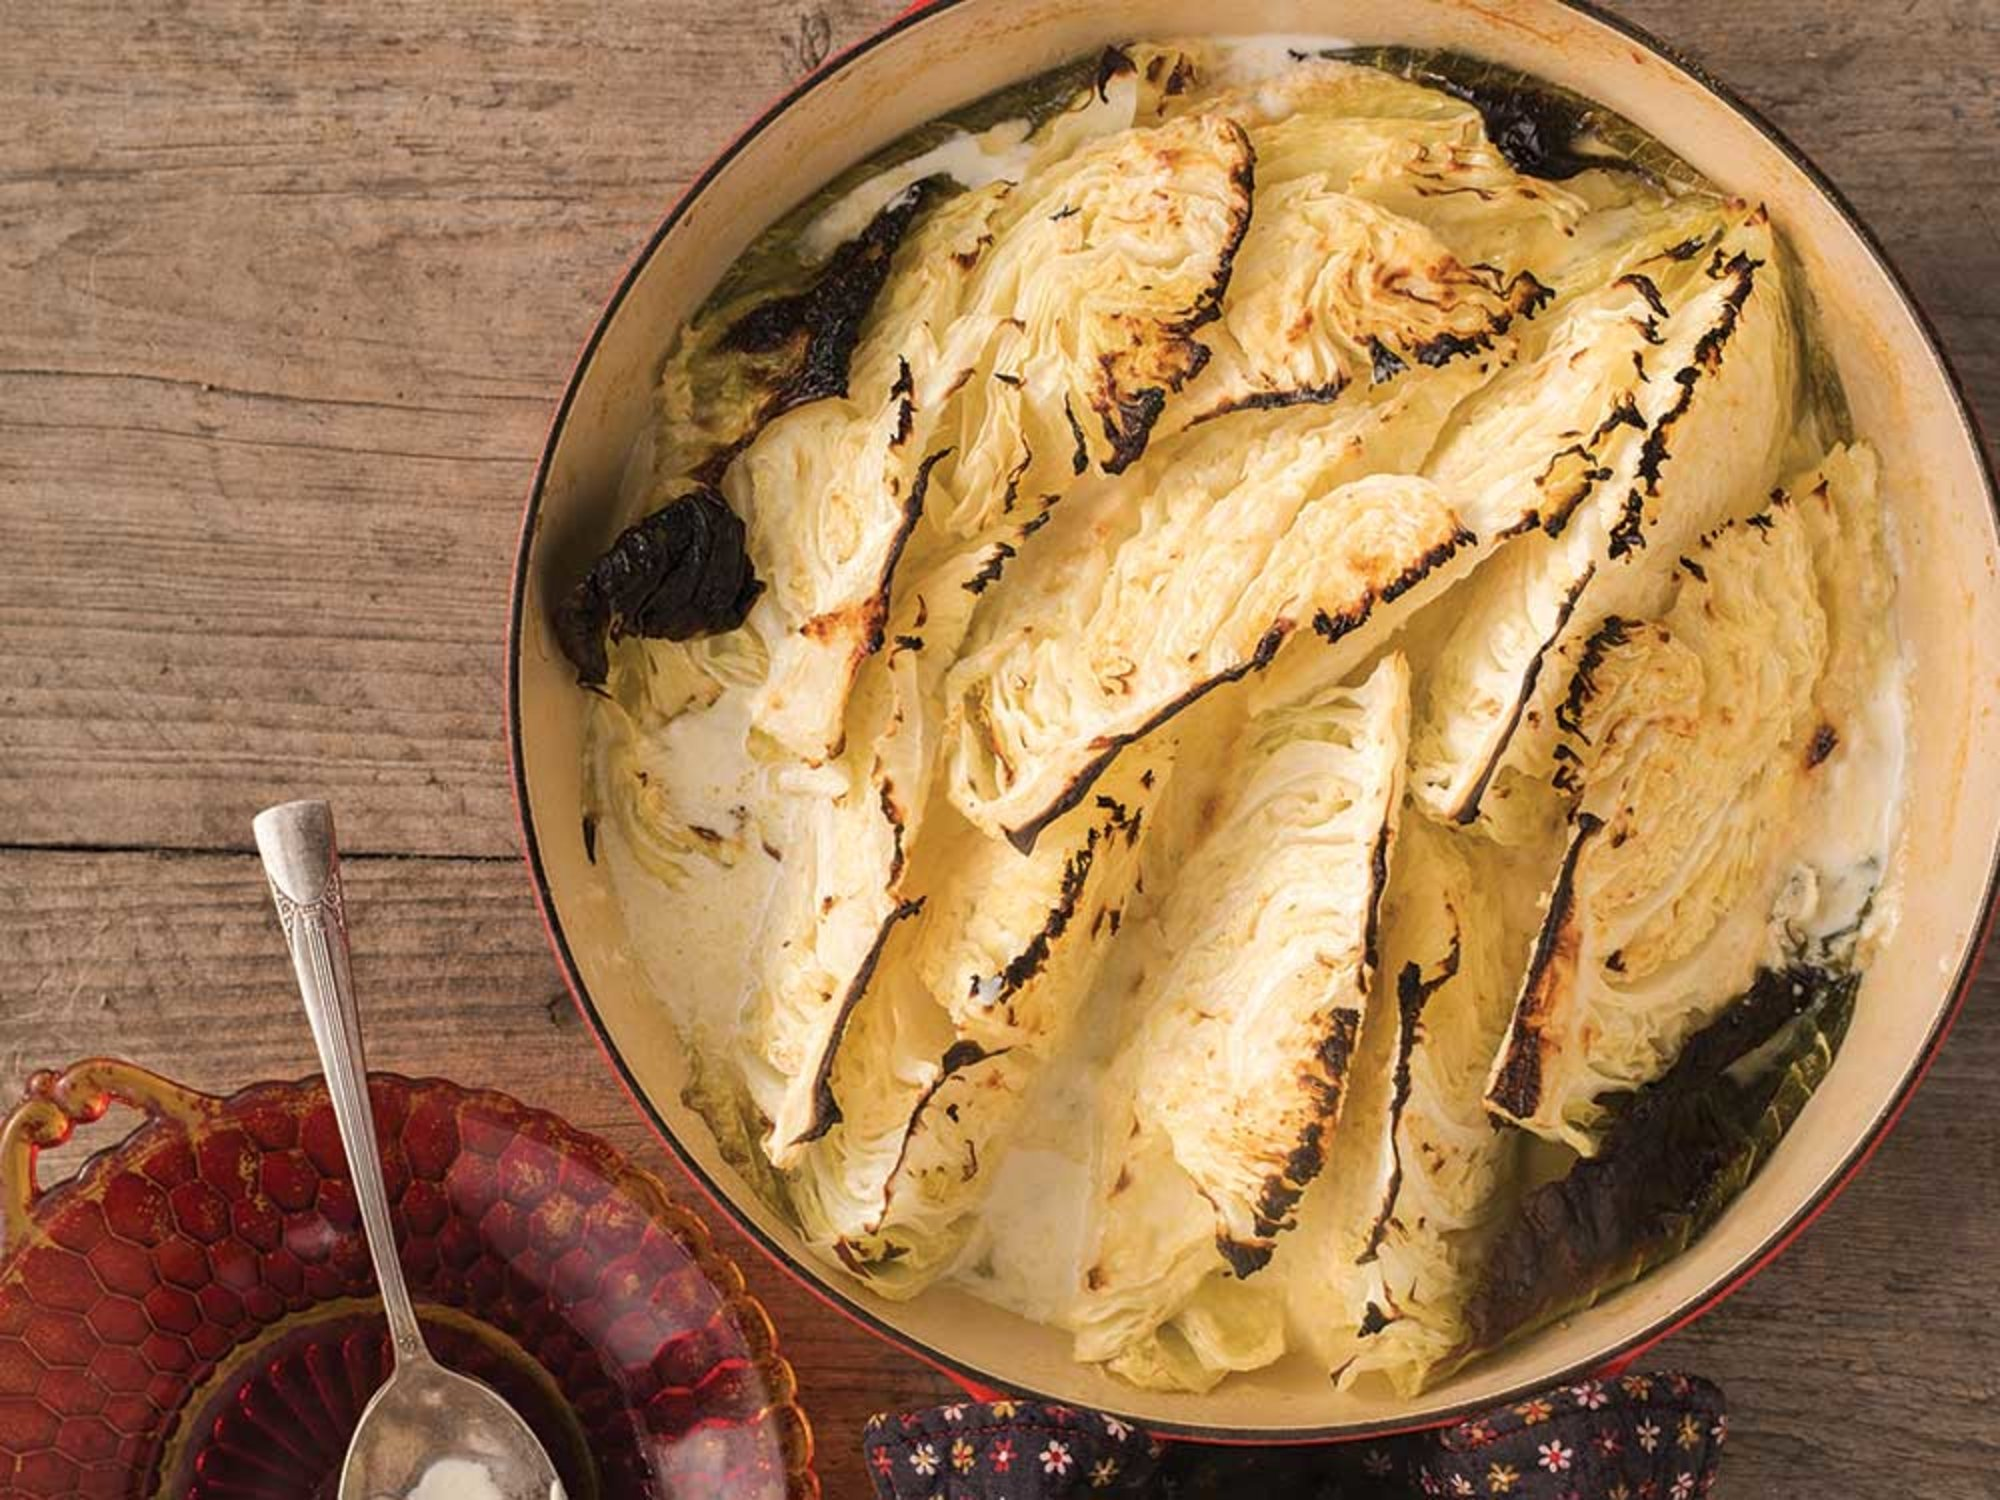 roasted-cabbage-horseradish-cream-1000x750.jpg